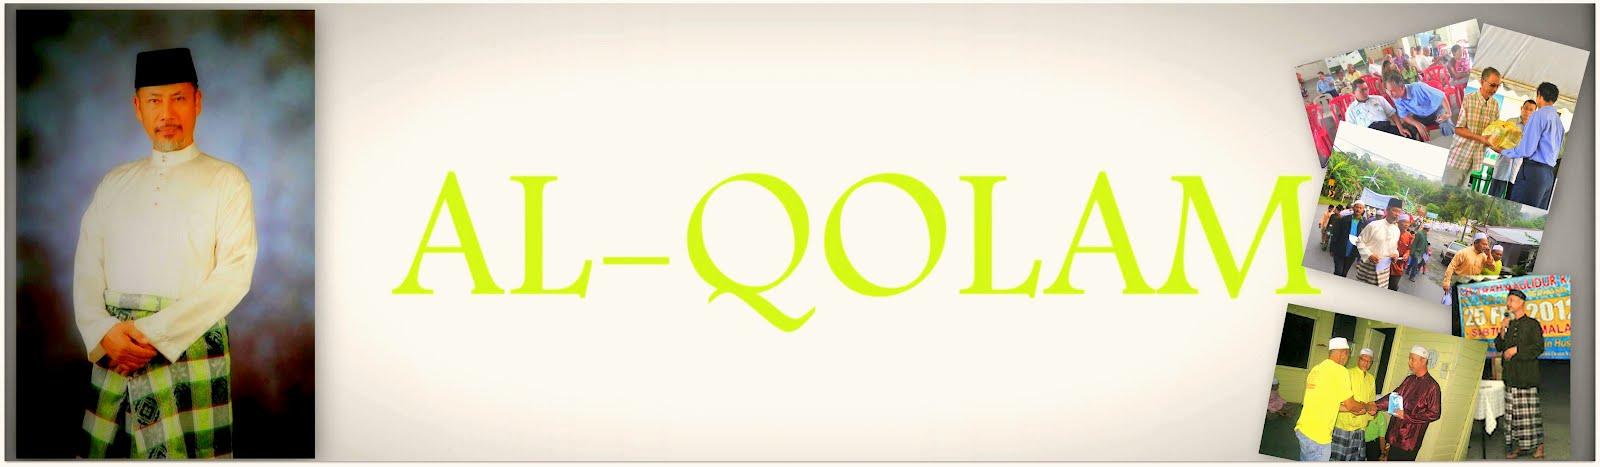 AL-QOLAM